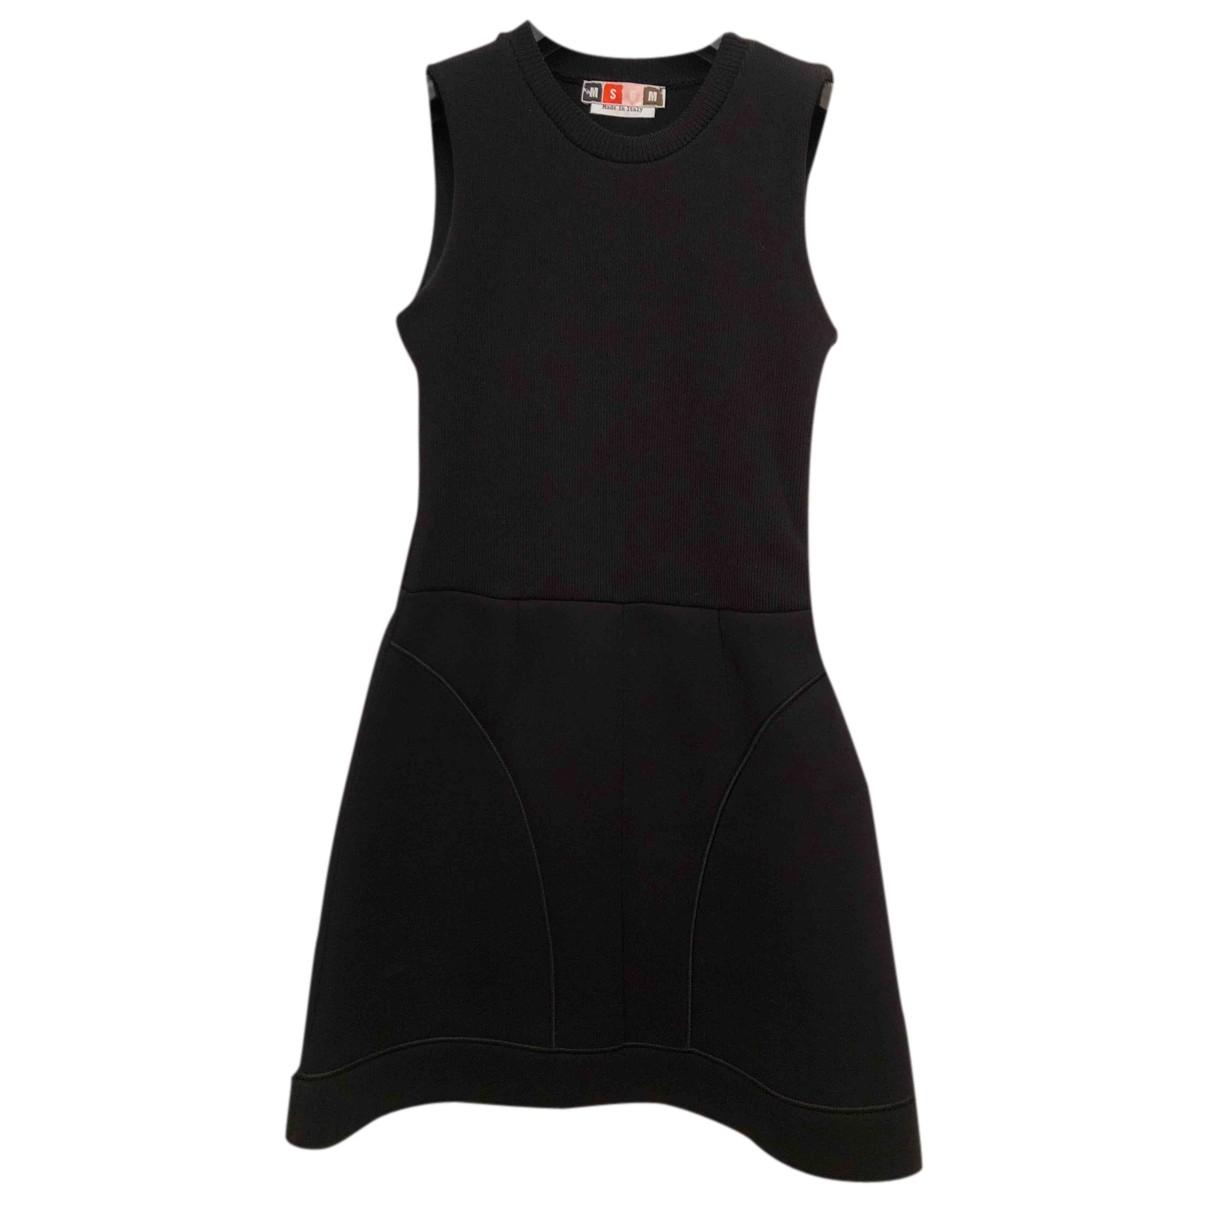 Msgm N Black Cotton dress for Women M International